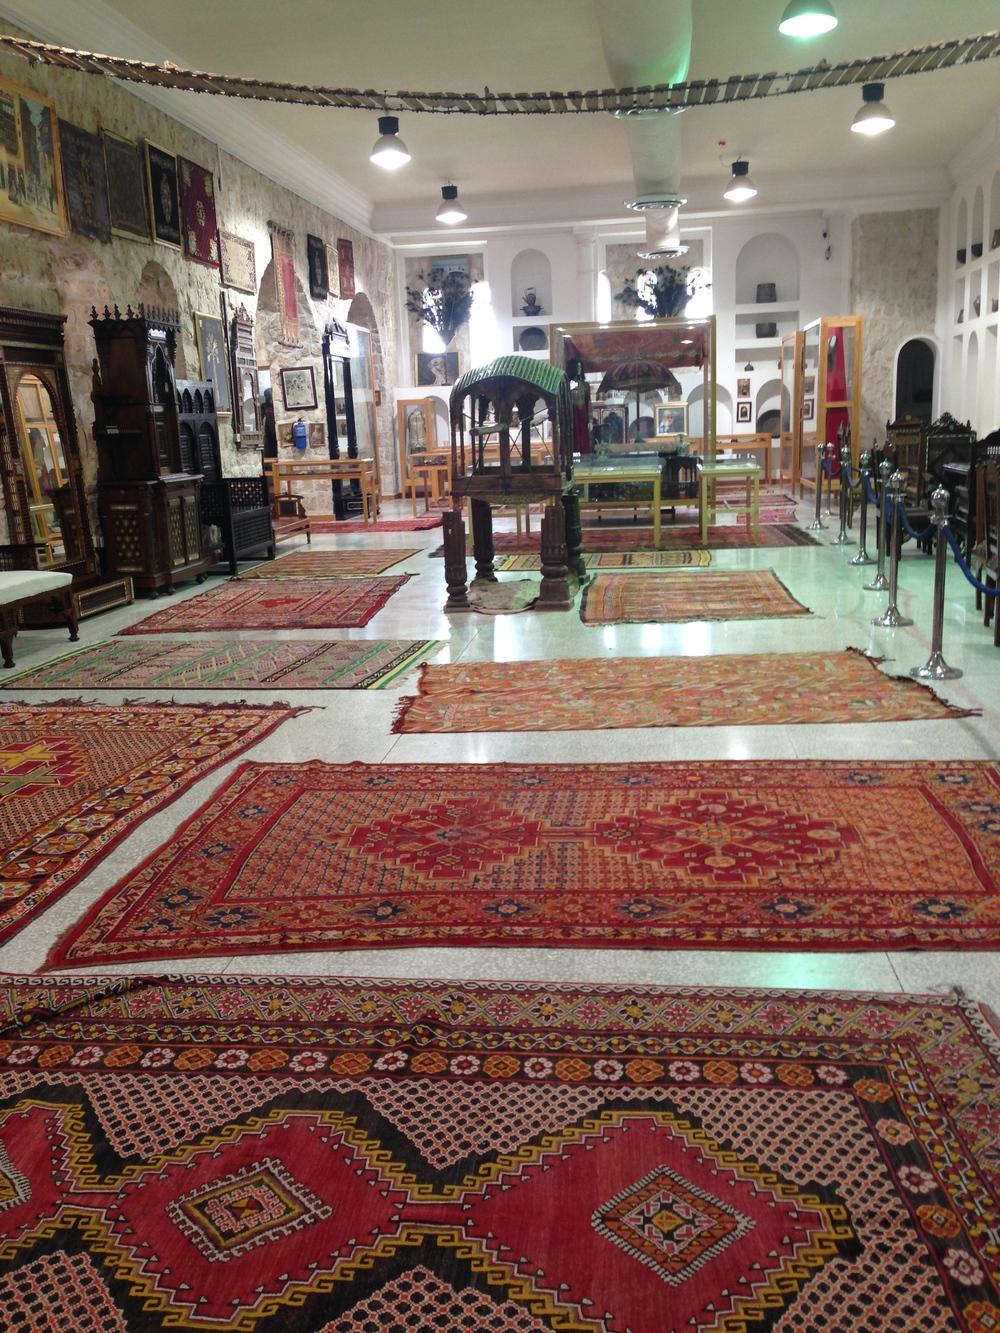 Sheikh Faisal Bin Qassim Al-Thani Museum.